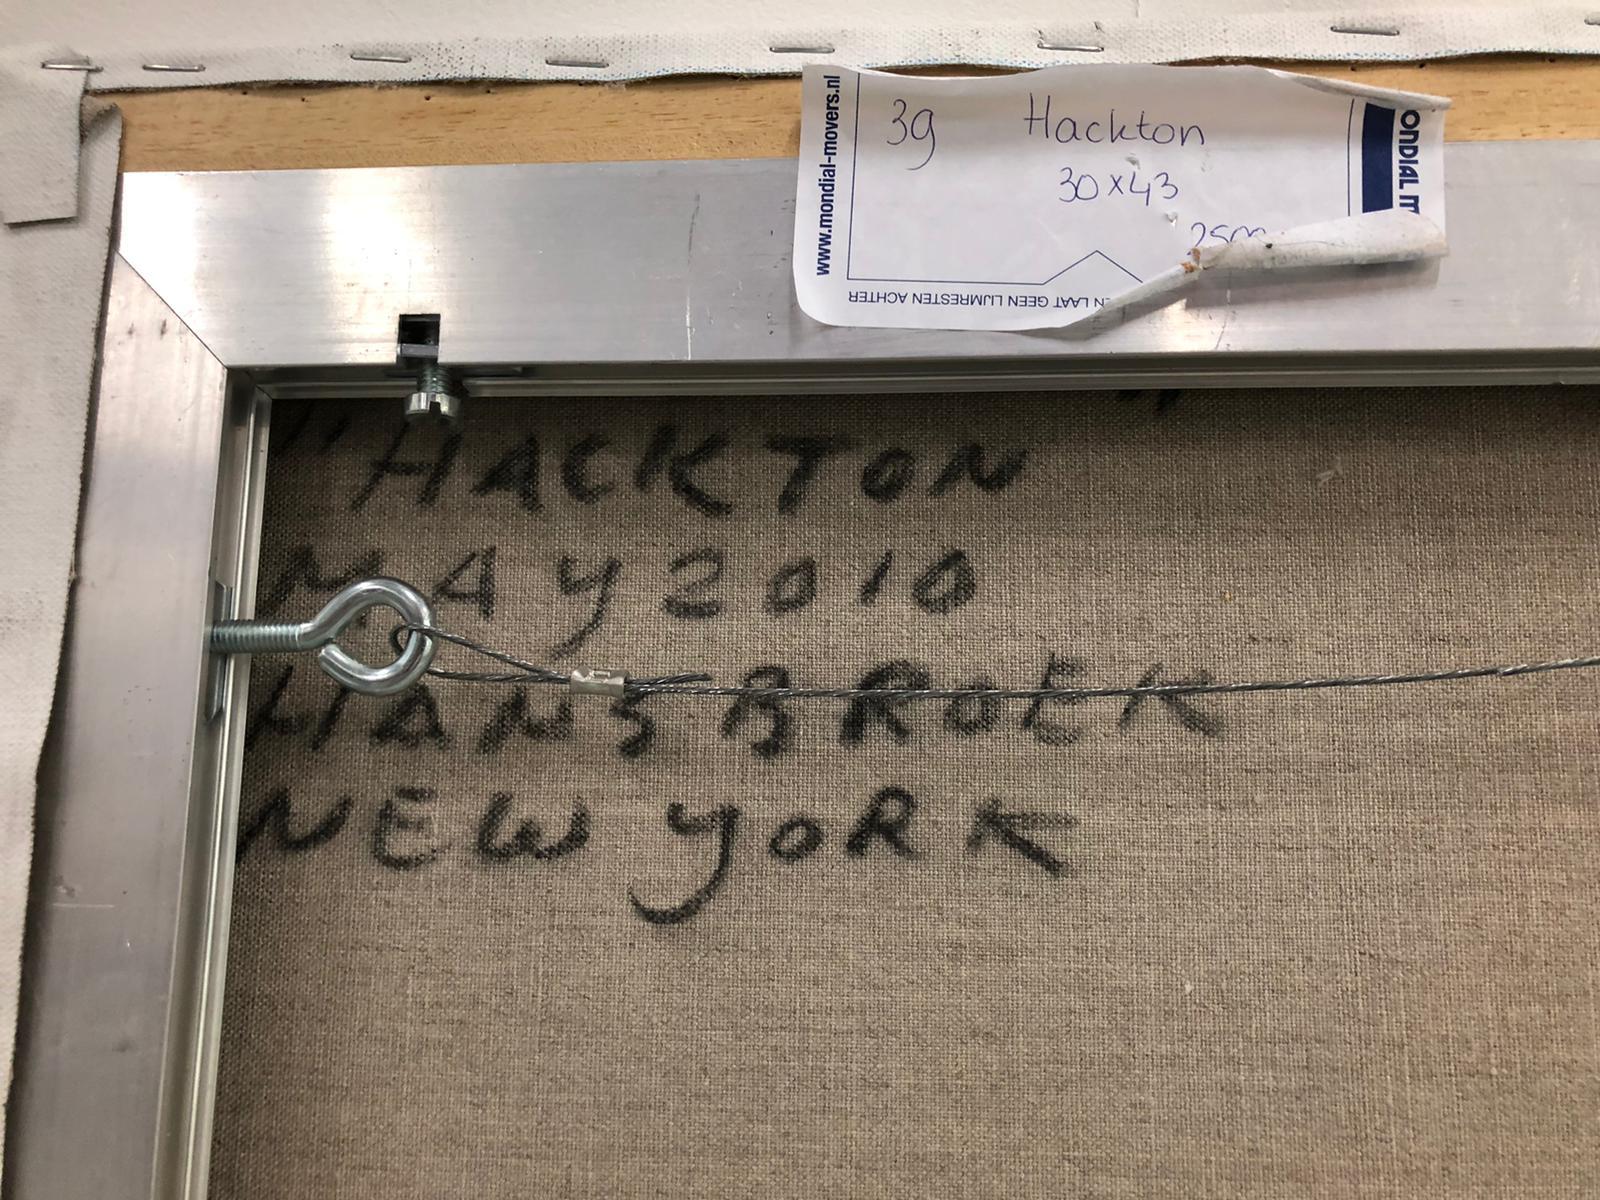 Hans Broek – Detail 1 Hackton